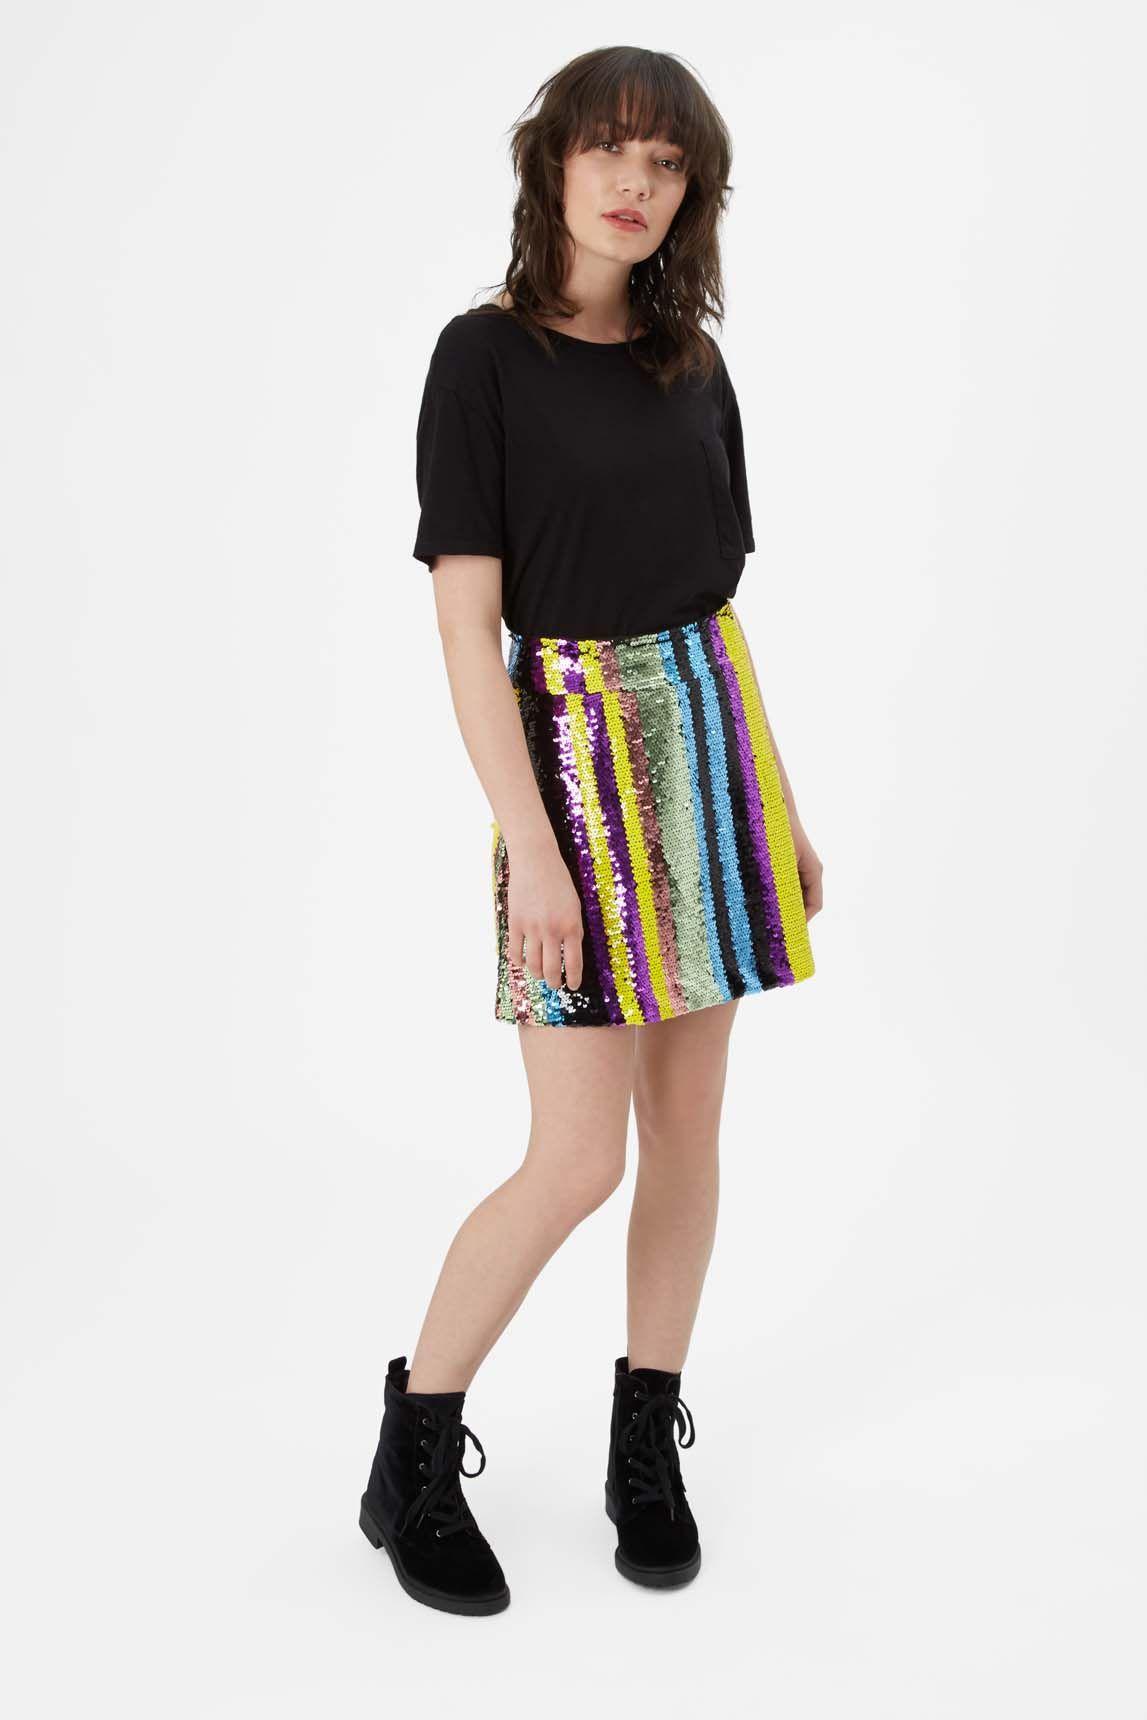 Sequin Mini Skirt in Multicoloured